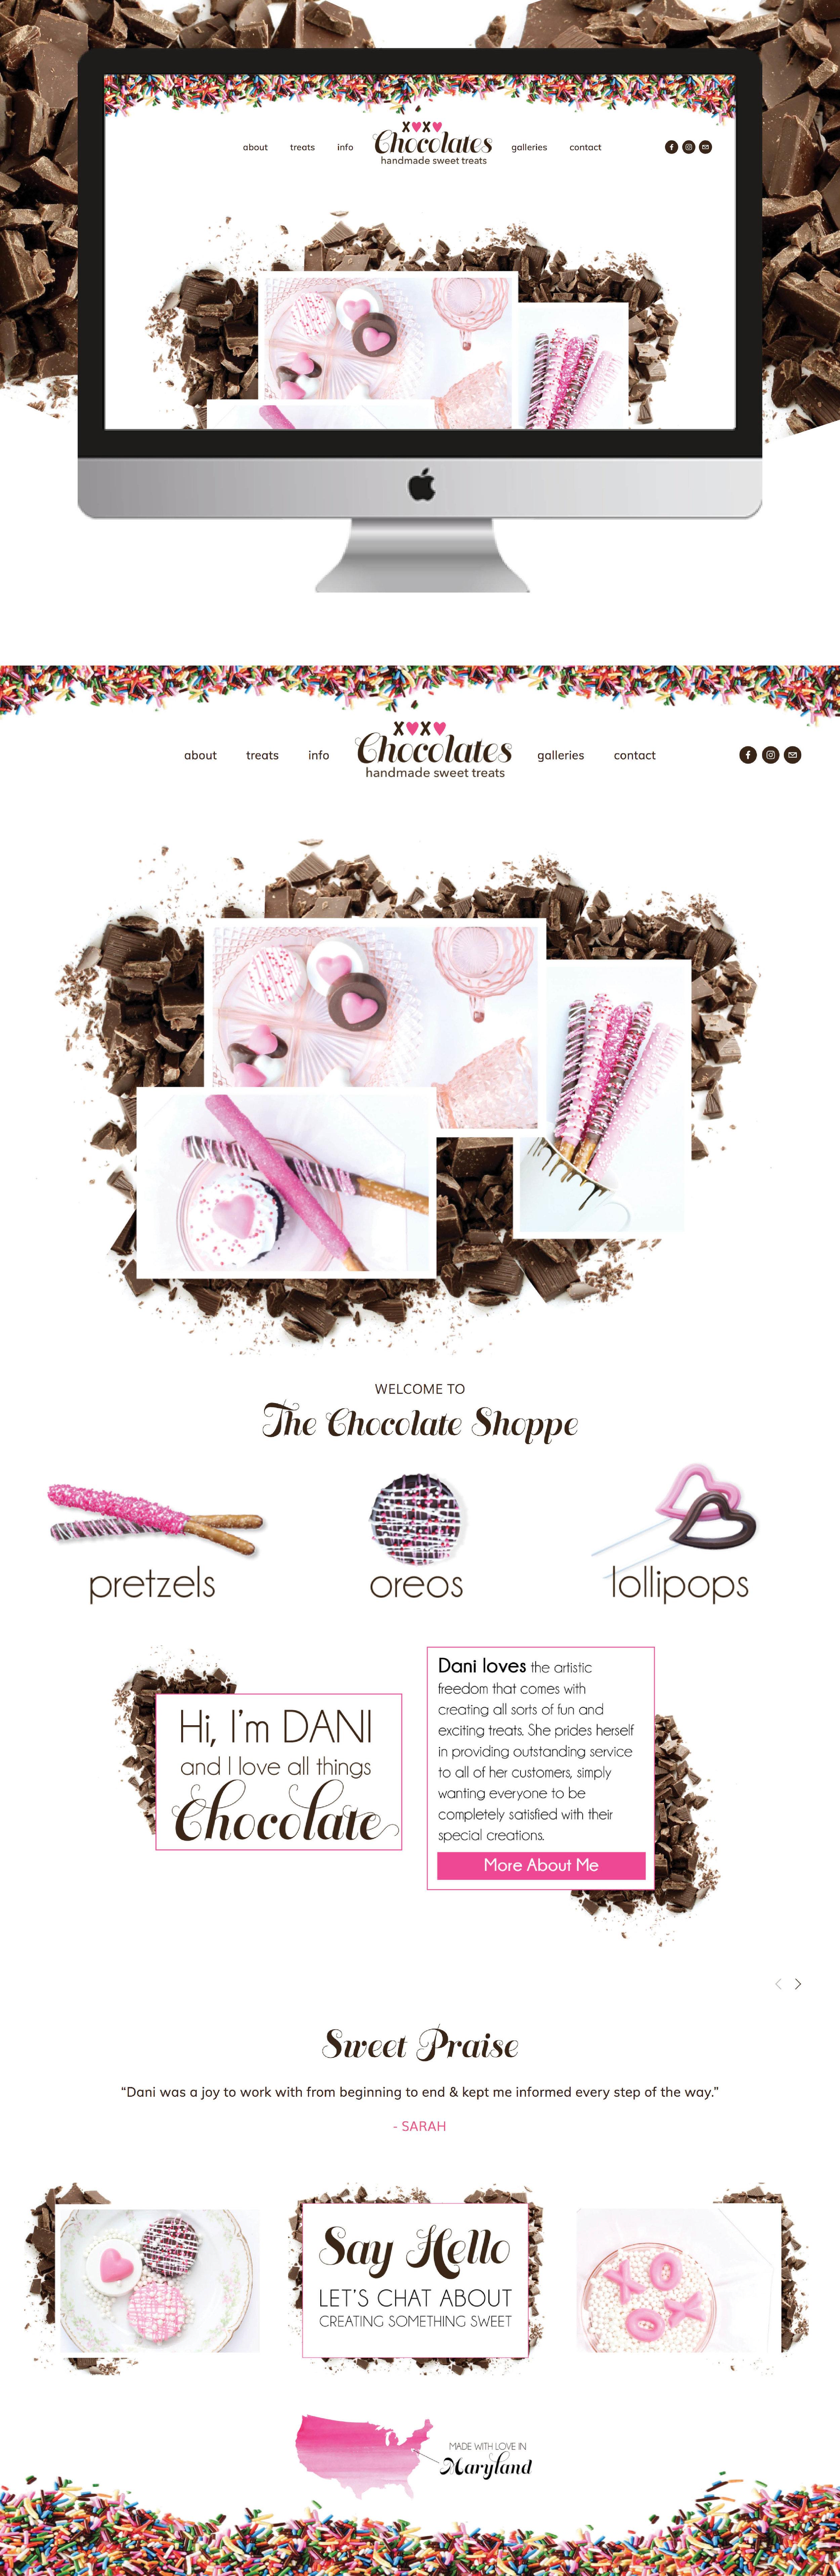 xoxo Chocolates Website Design